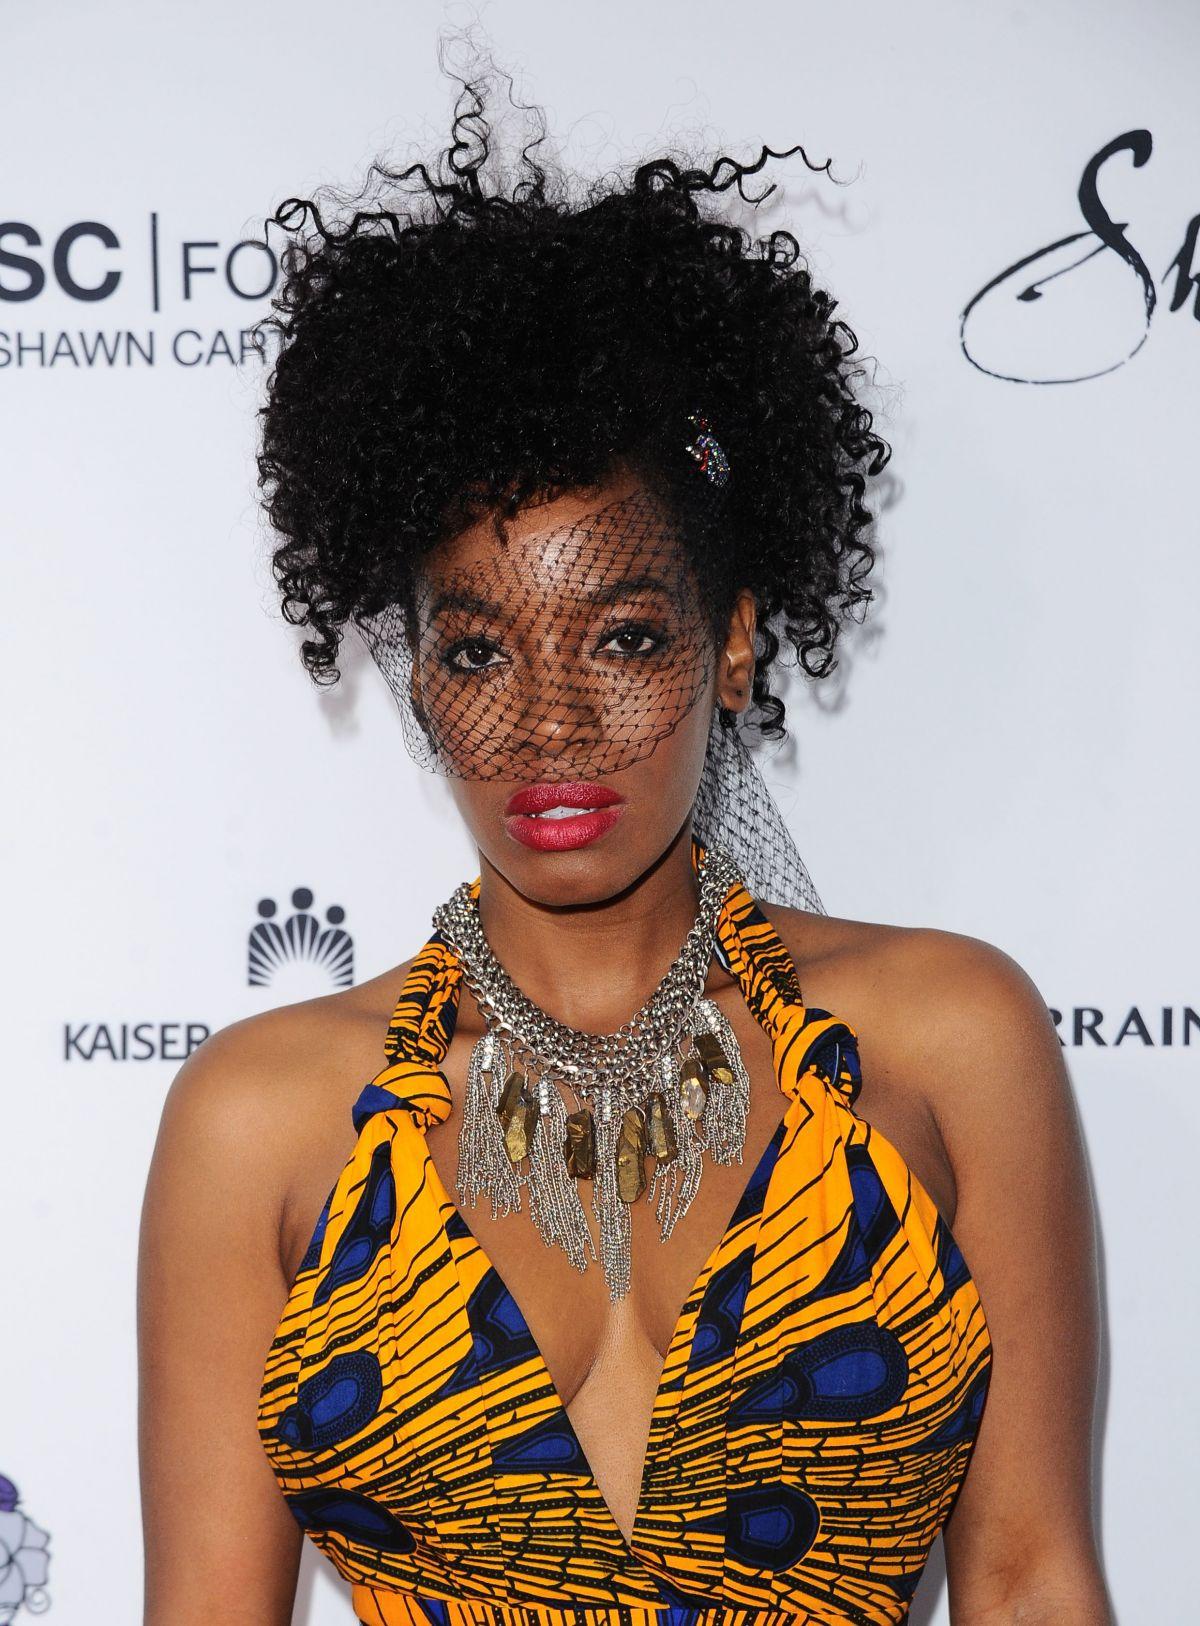 Gala African California Milauna At Jackson Art American Wearable kZuTXiOP